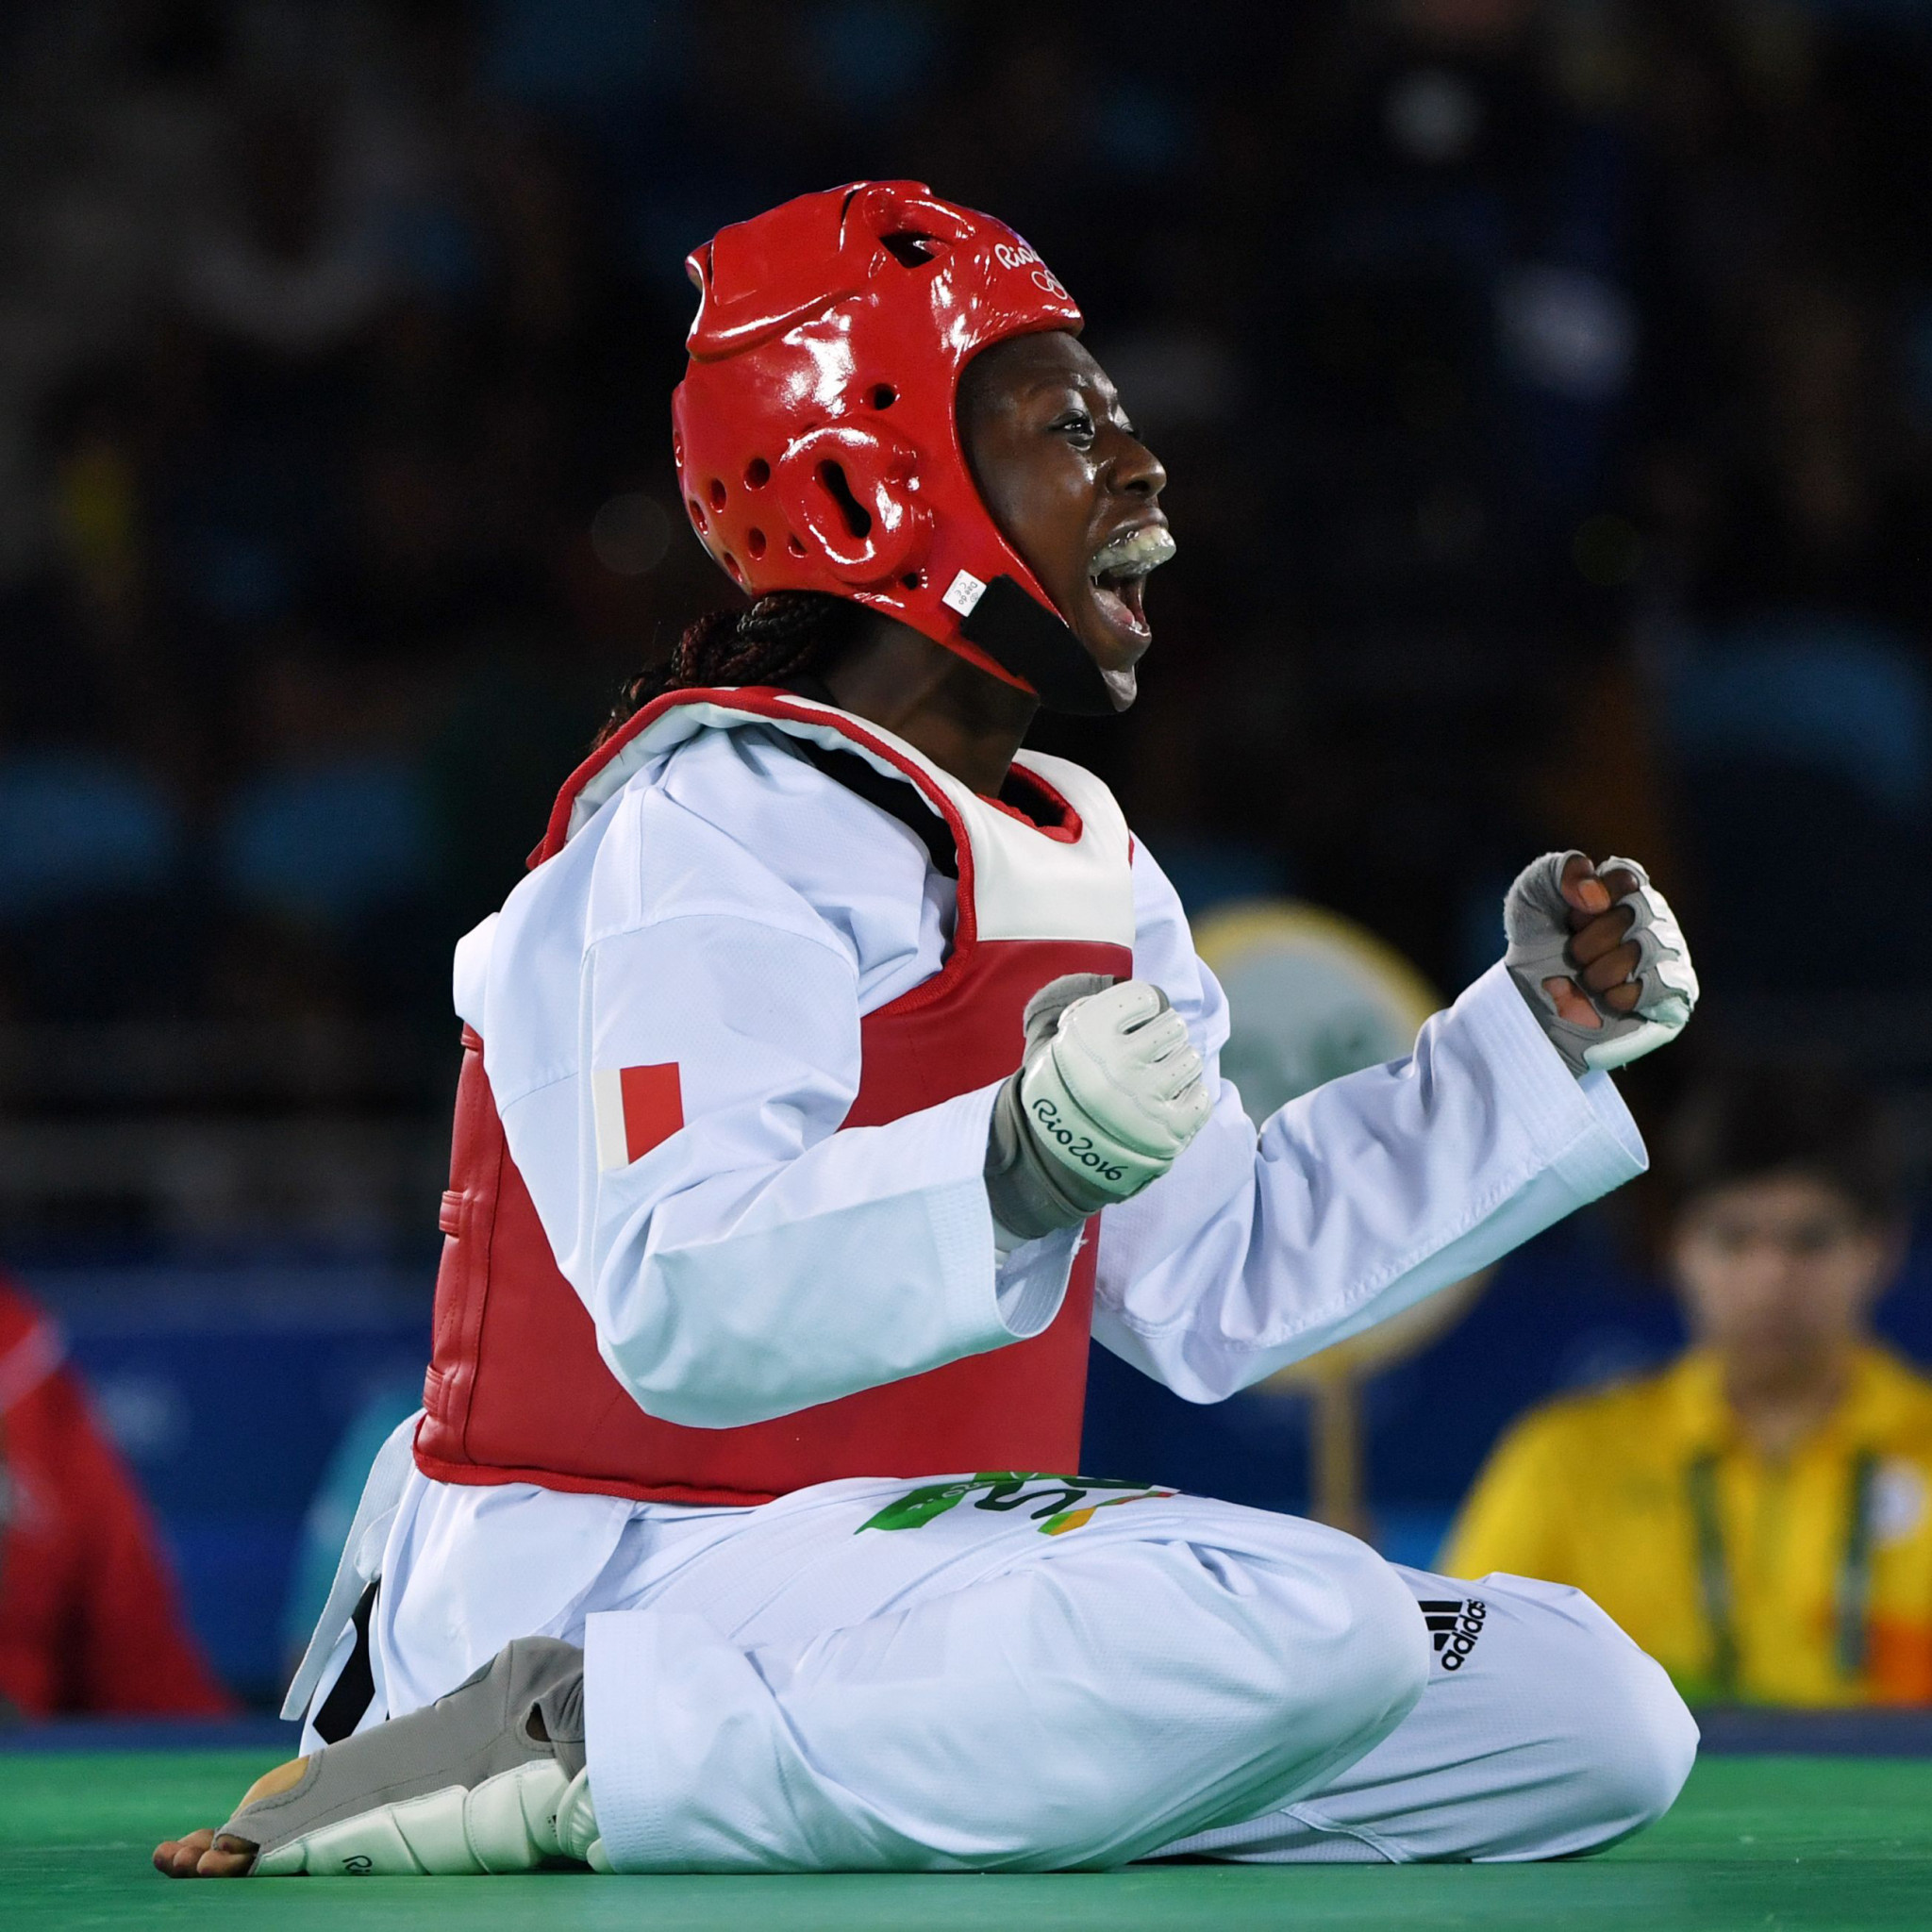 Haby Niaré - the scorpion kicker heads into retirement